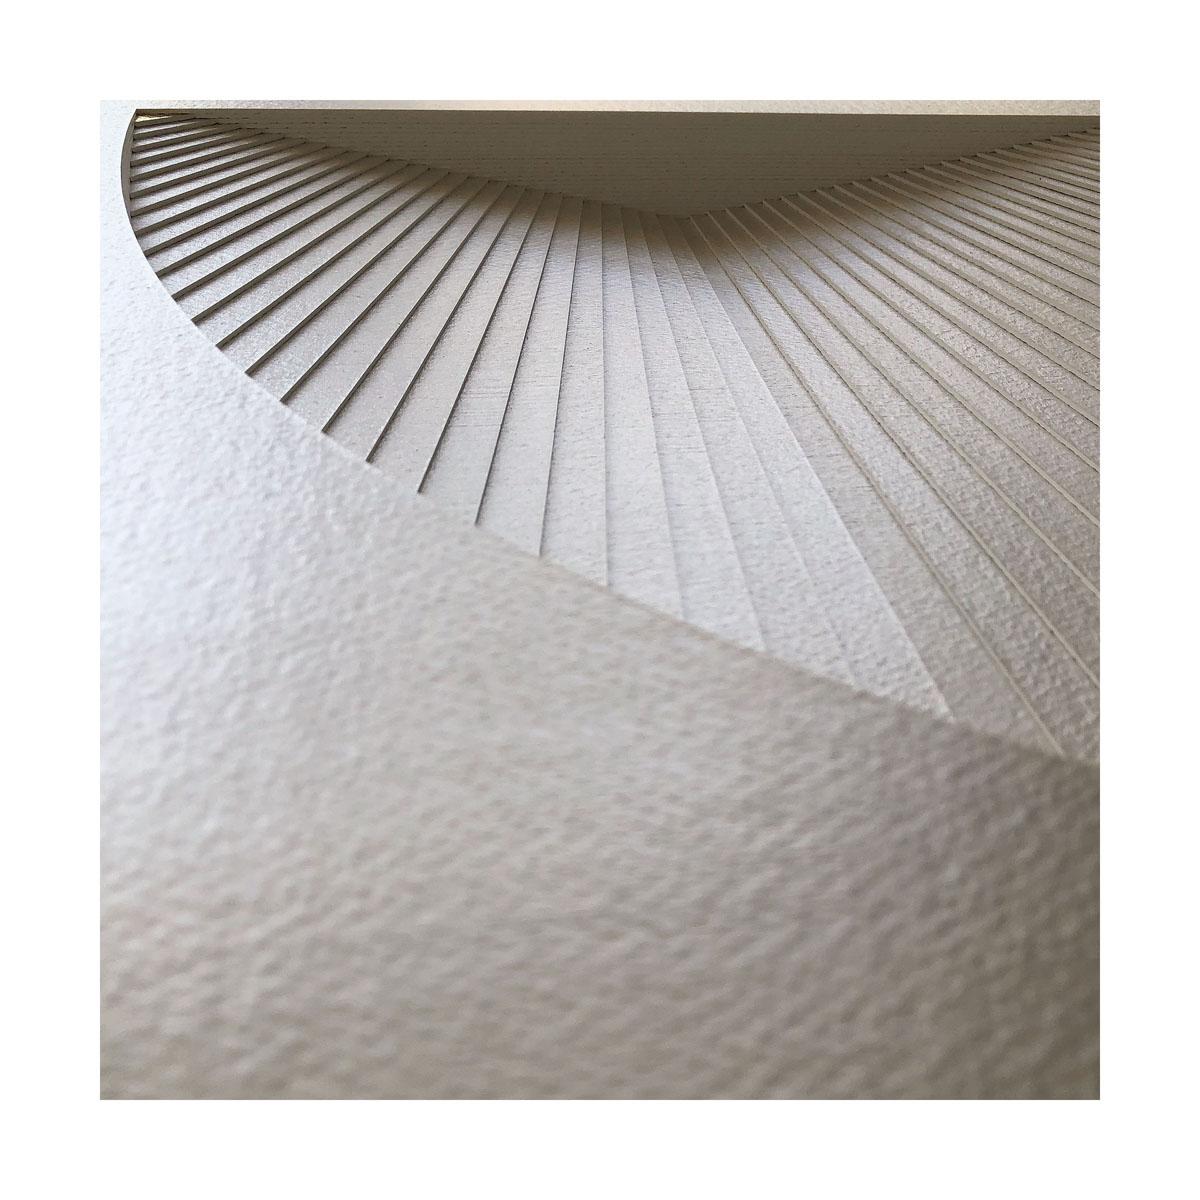 The space between us - detail - visual art